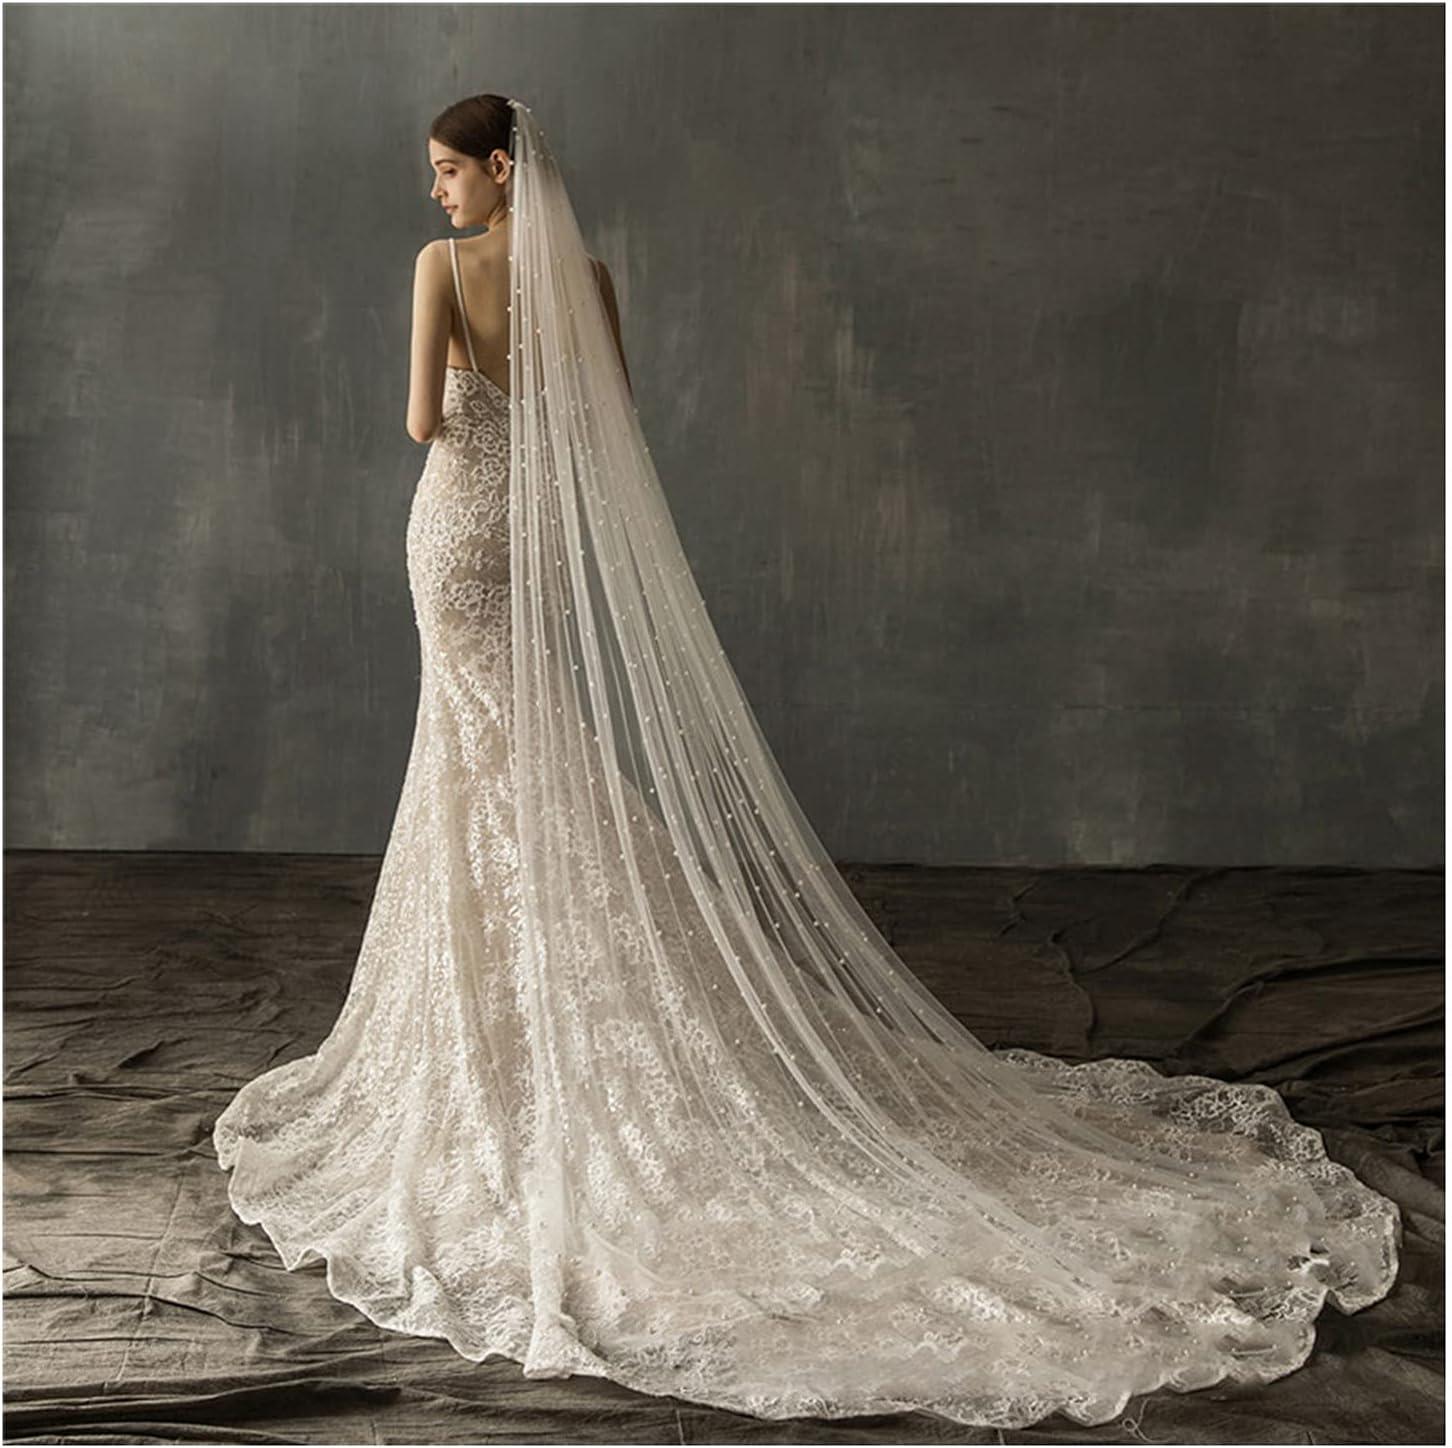 HEMOTONE Ladies Pearl Veil Comb Brida Cathedral Long Luxury Indefinitely In stock